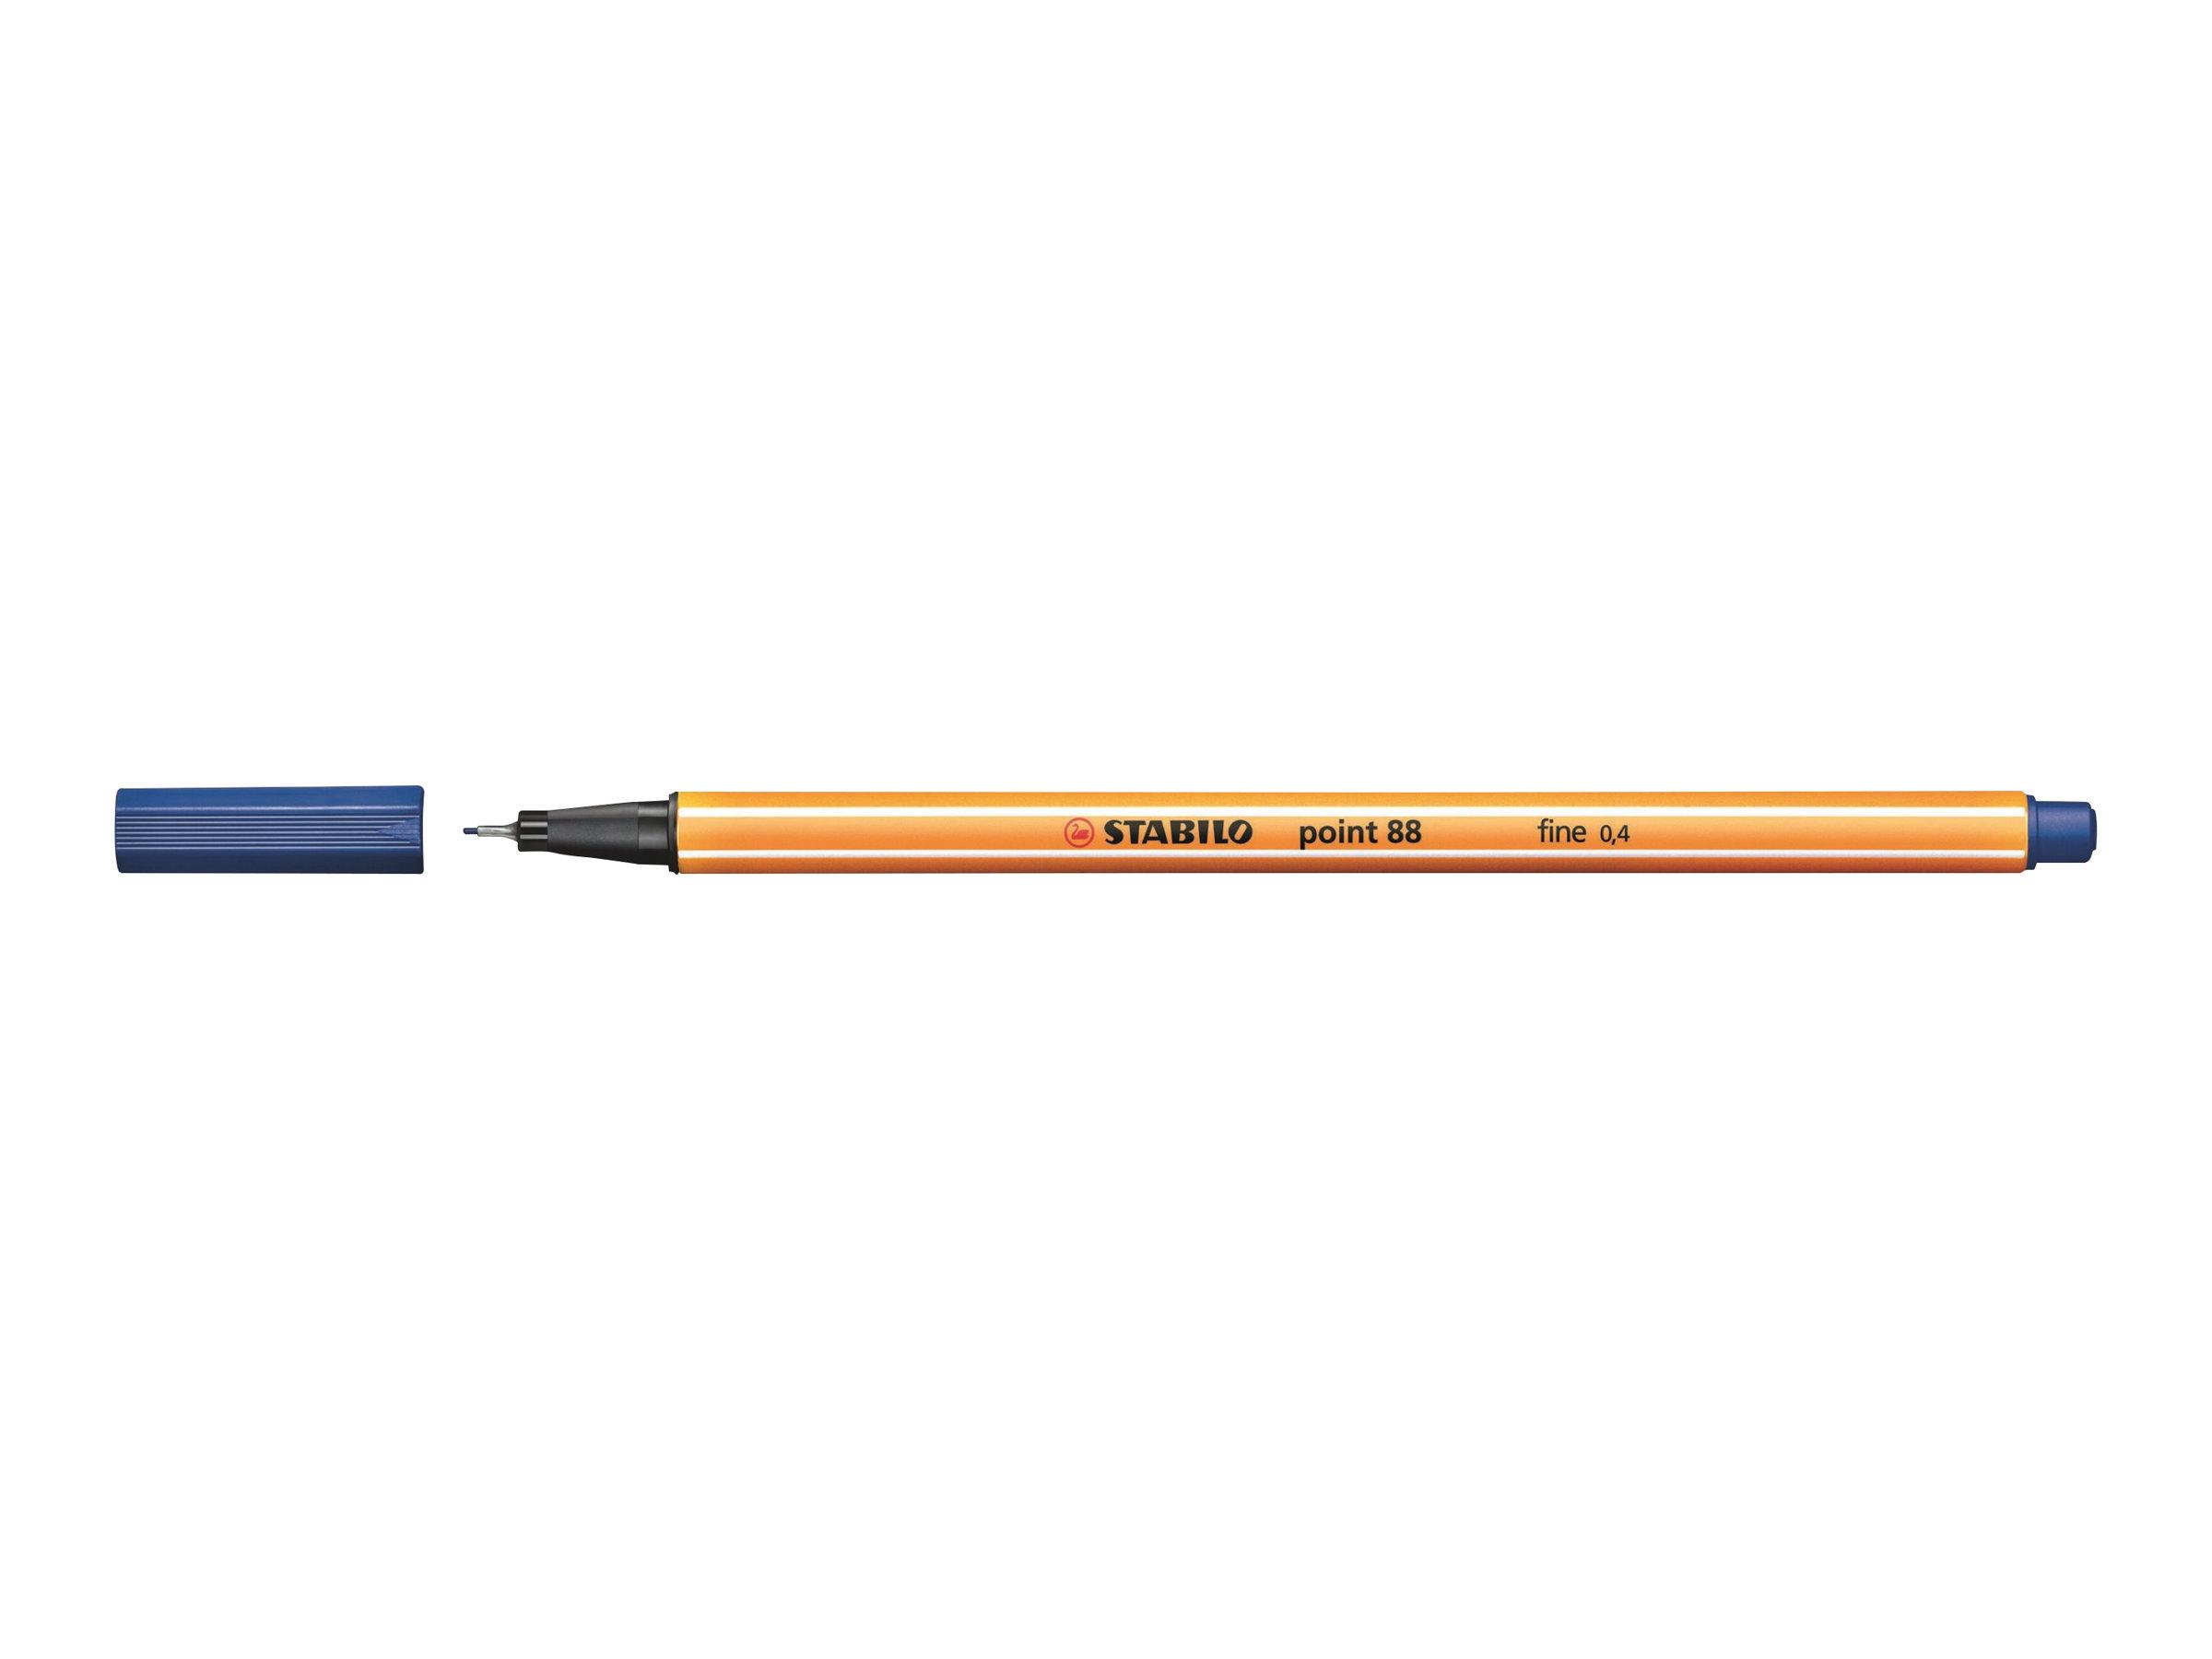 STABILO point 88 - Feutre fin - 0.4 mm - bleu